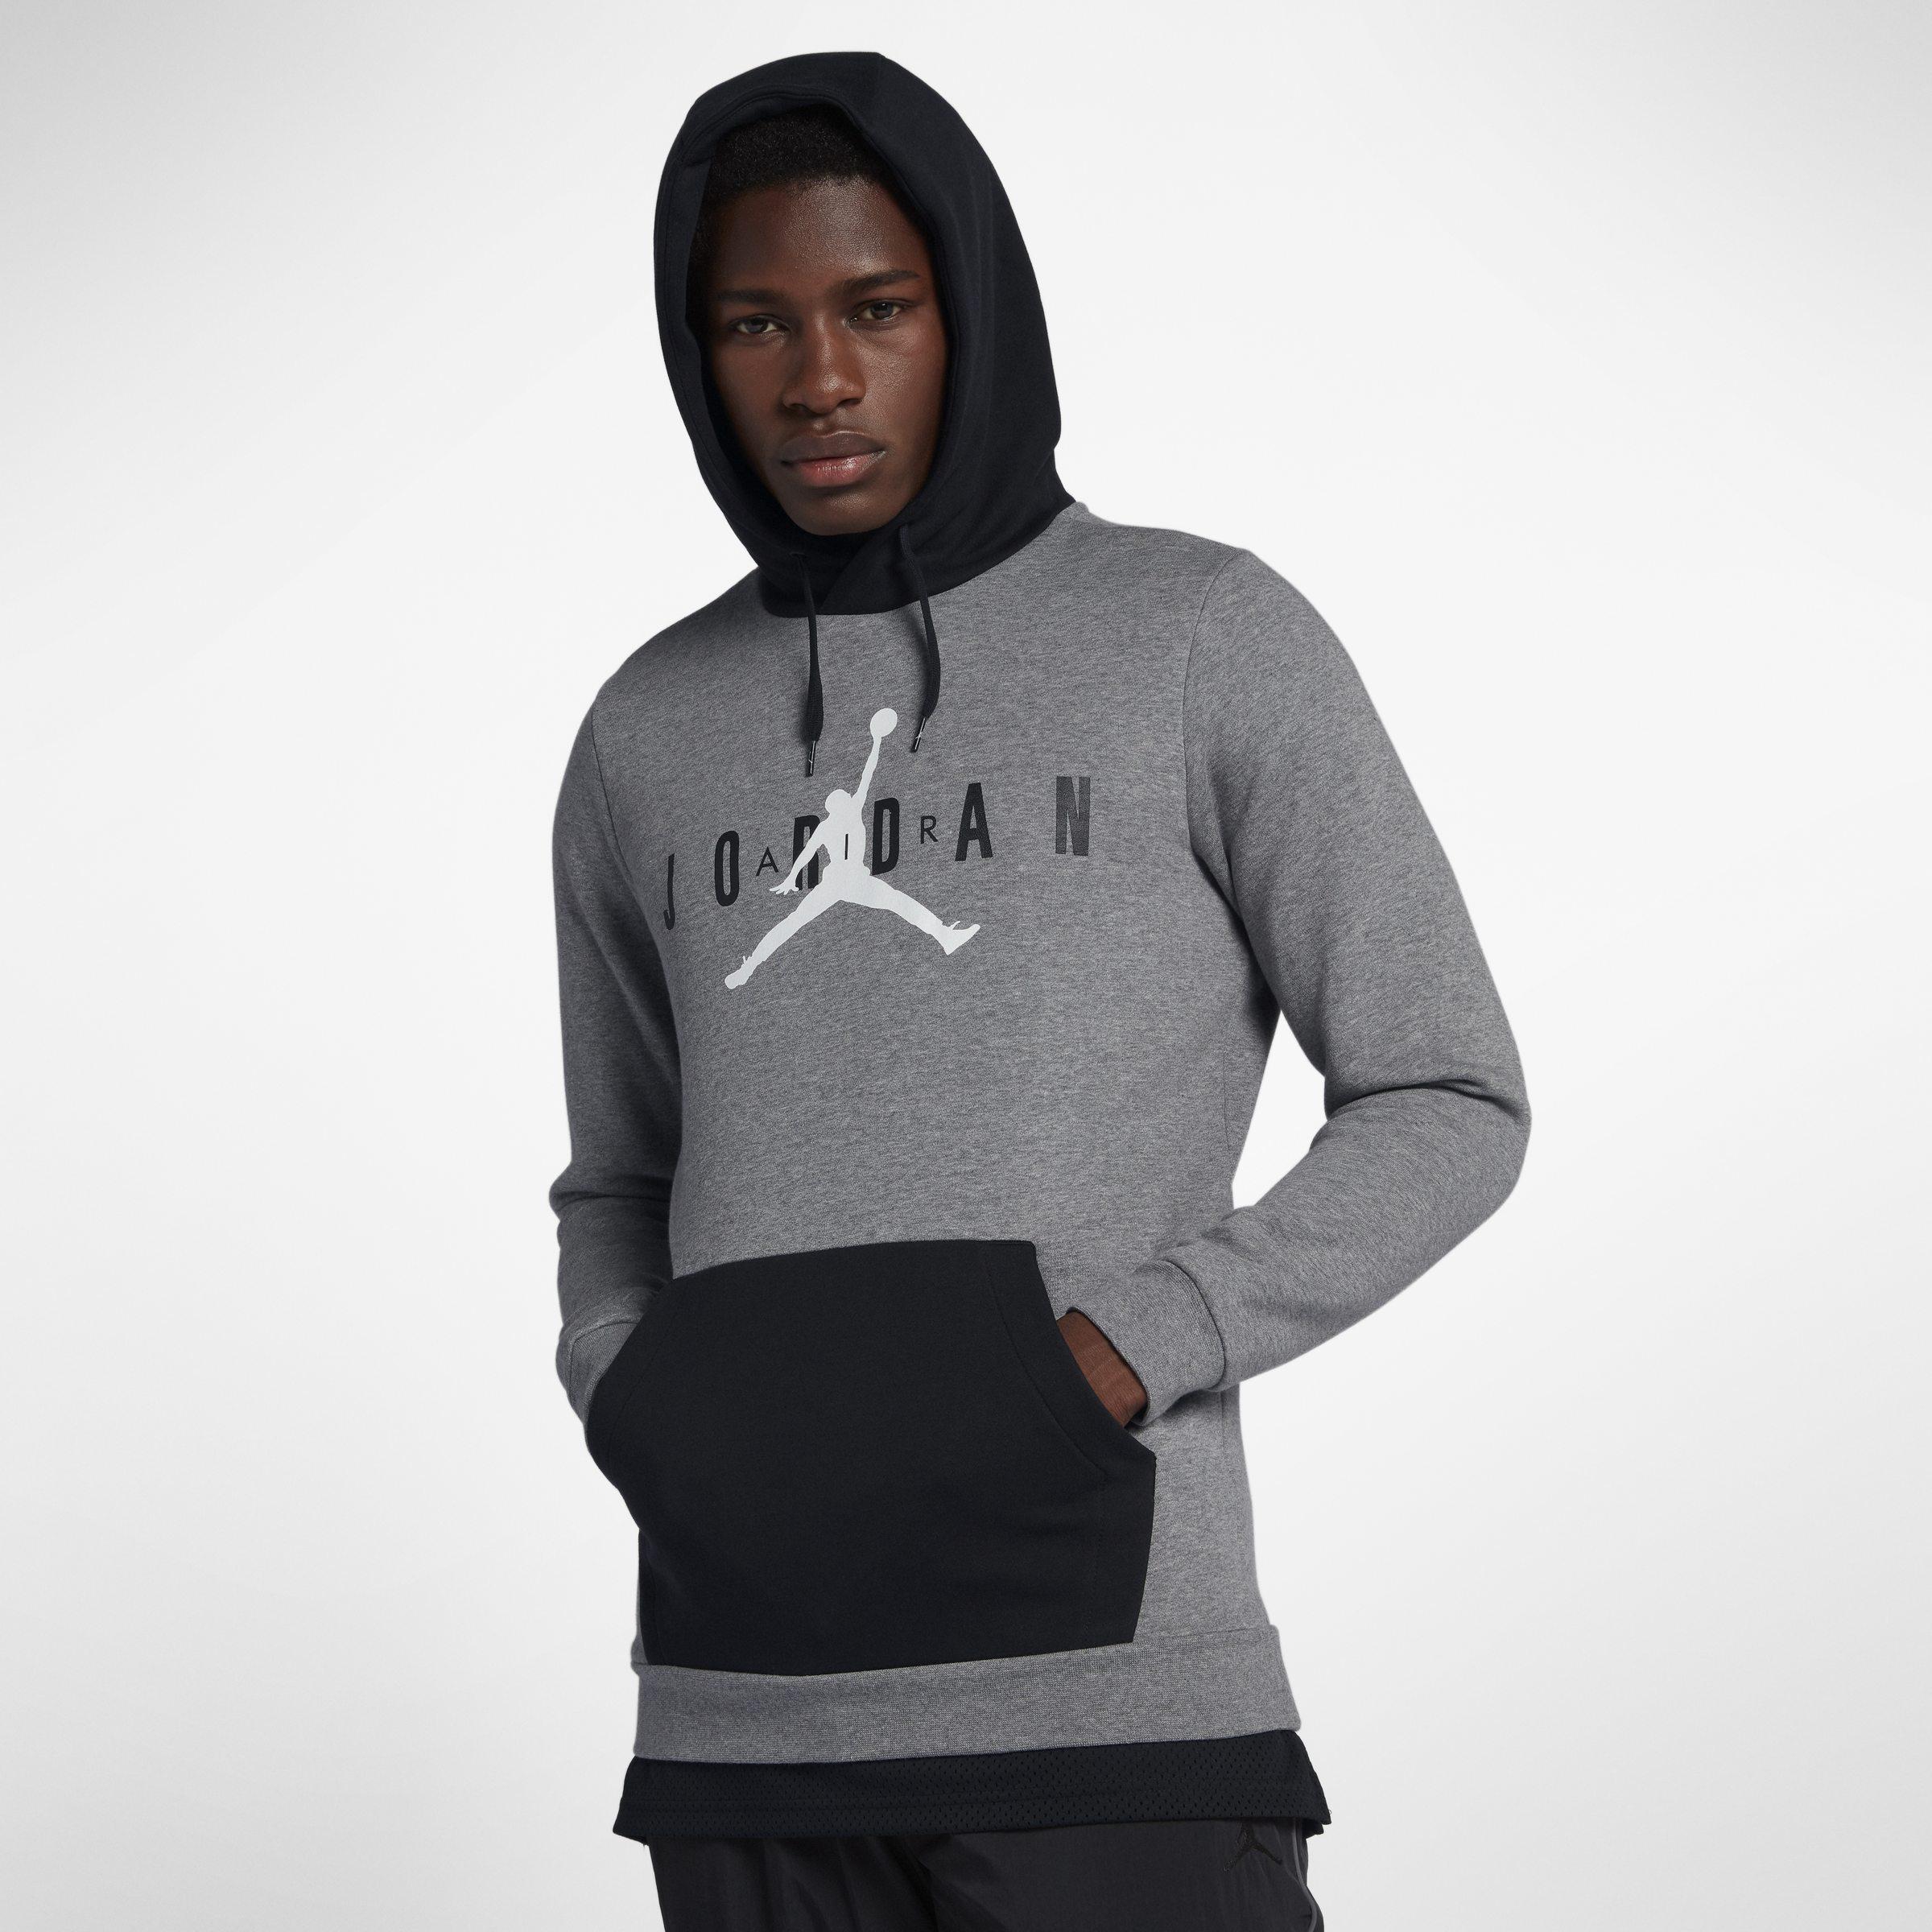 7d3ce2bbf06b46 Nike Jordan Jumpman Air Fleece Pullover Hoodie in Gray for Men - Lyst